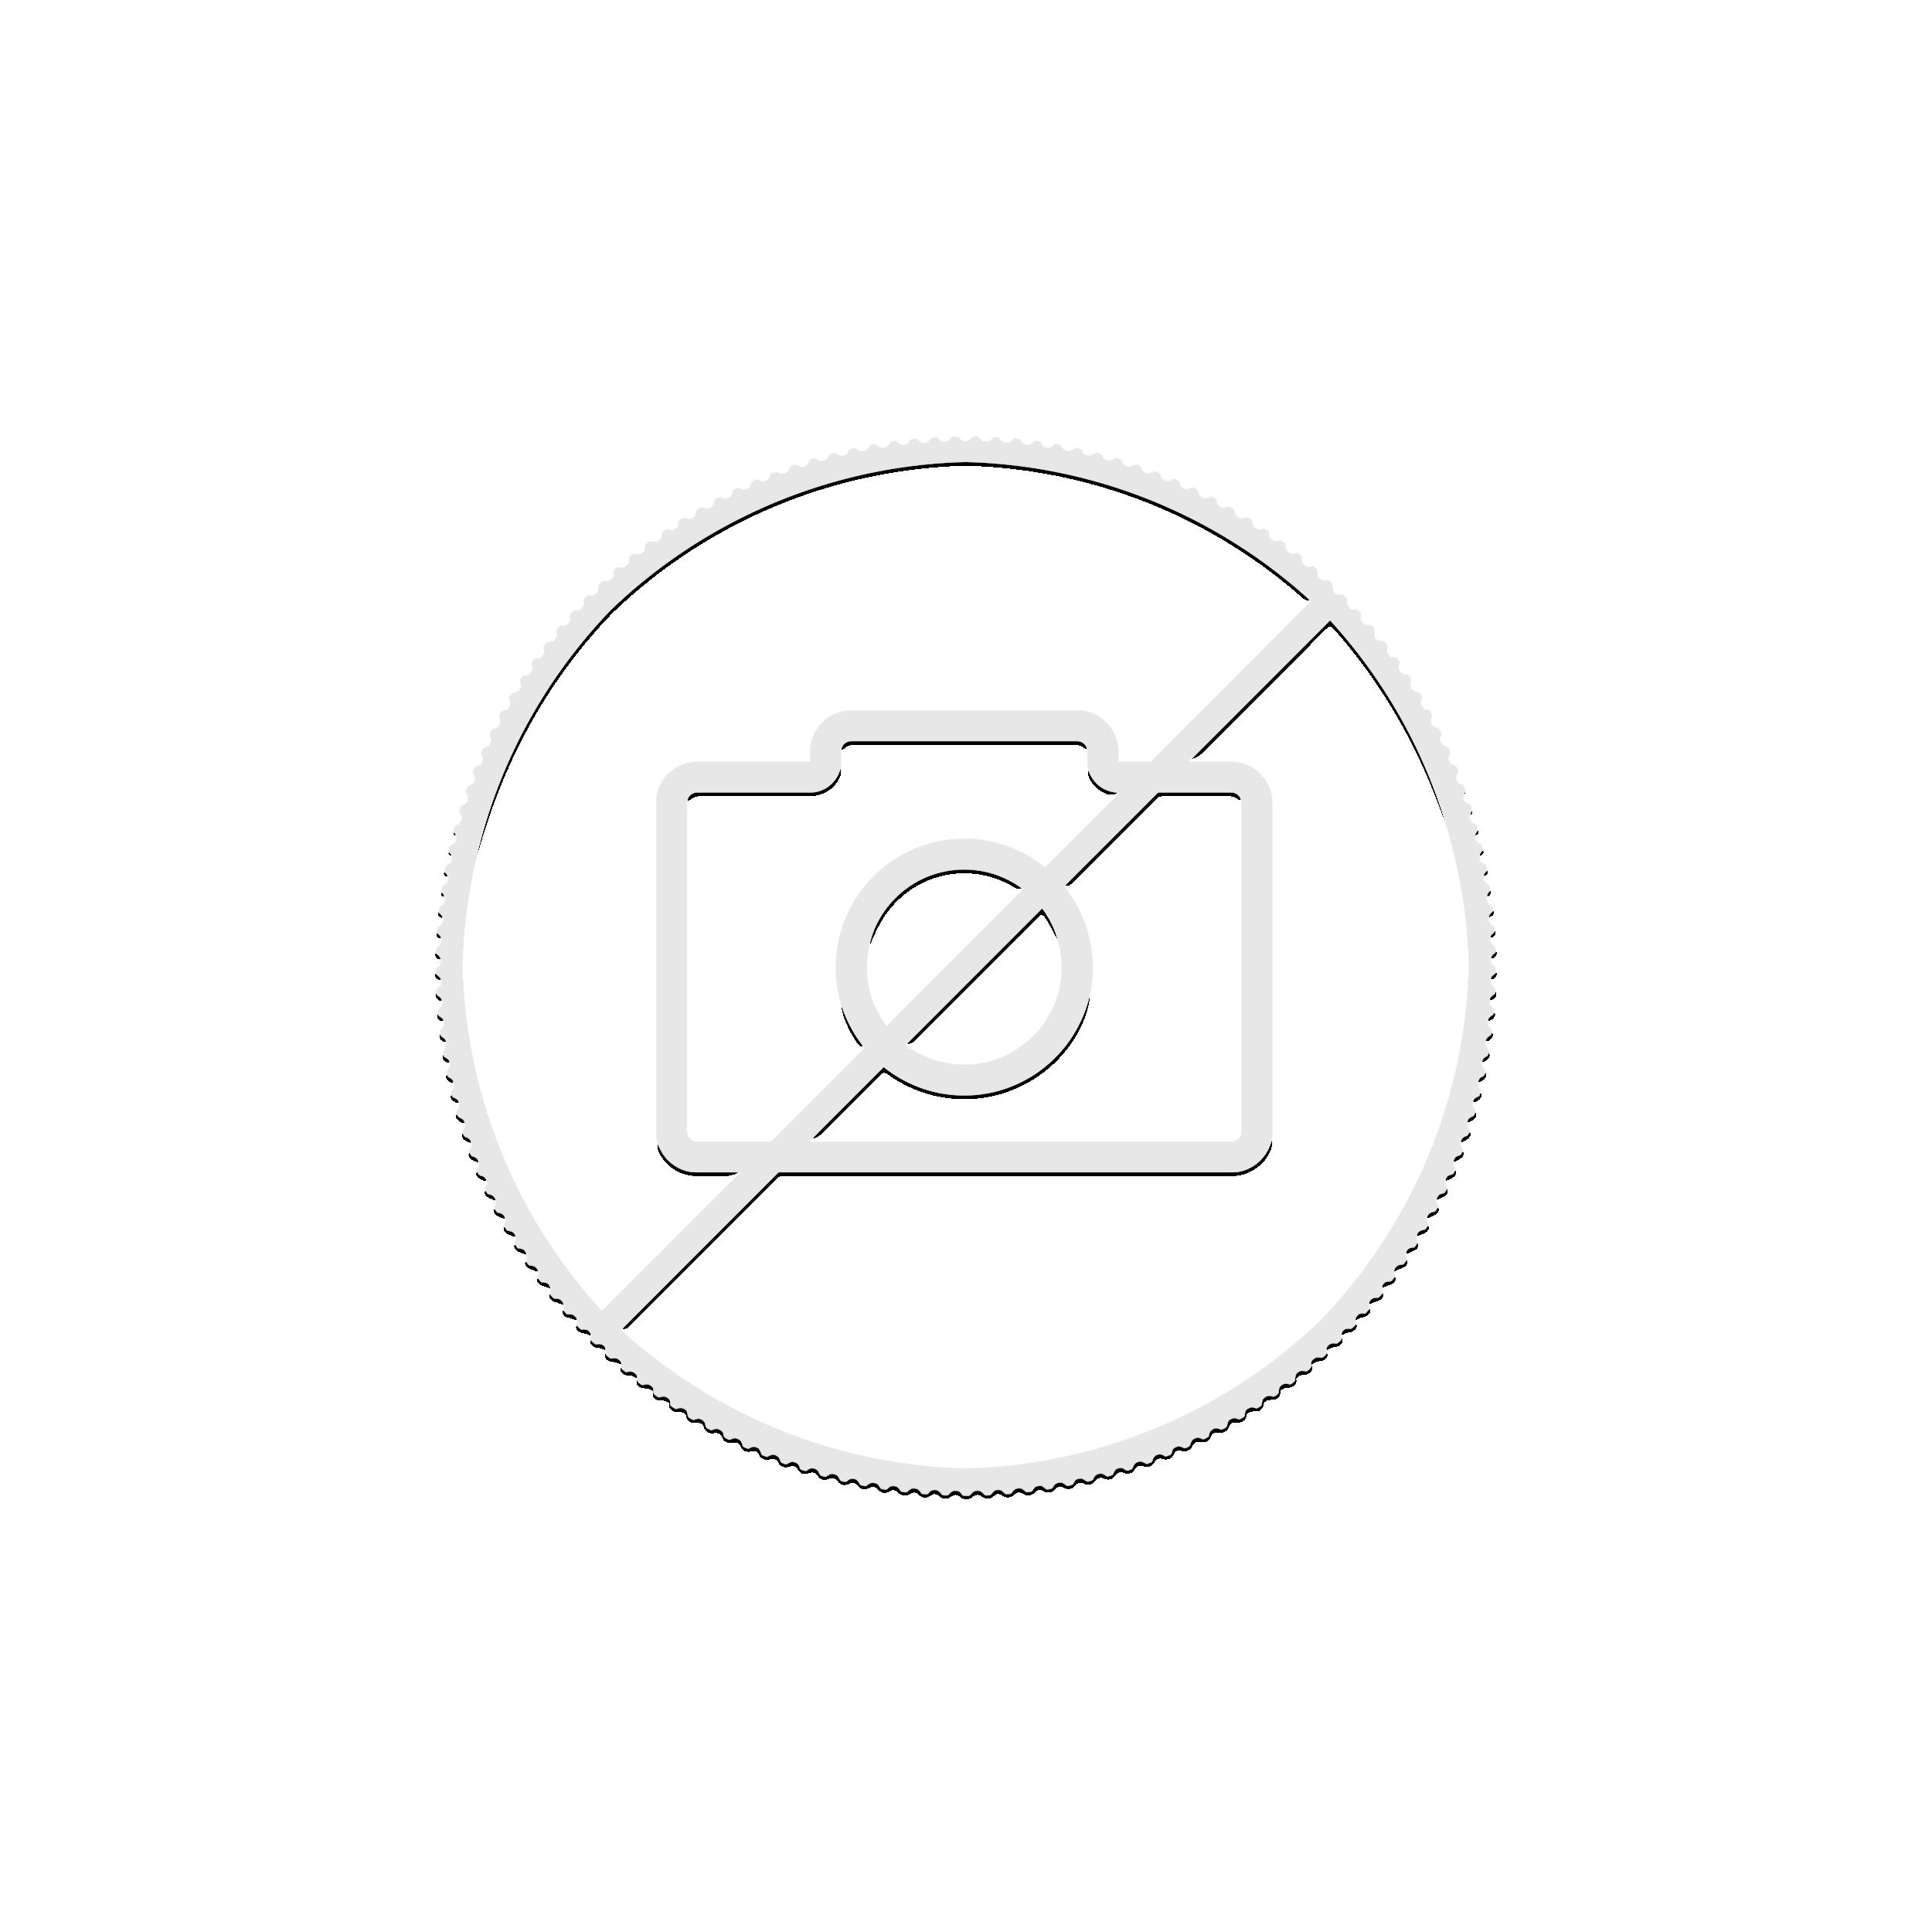 1 troy ounce zilveren munt gouden holo serie American Eagle 2021 - achterkant